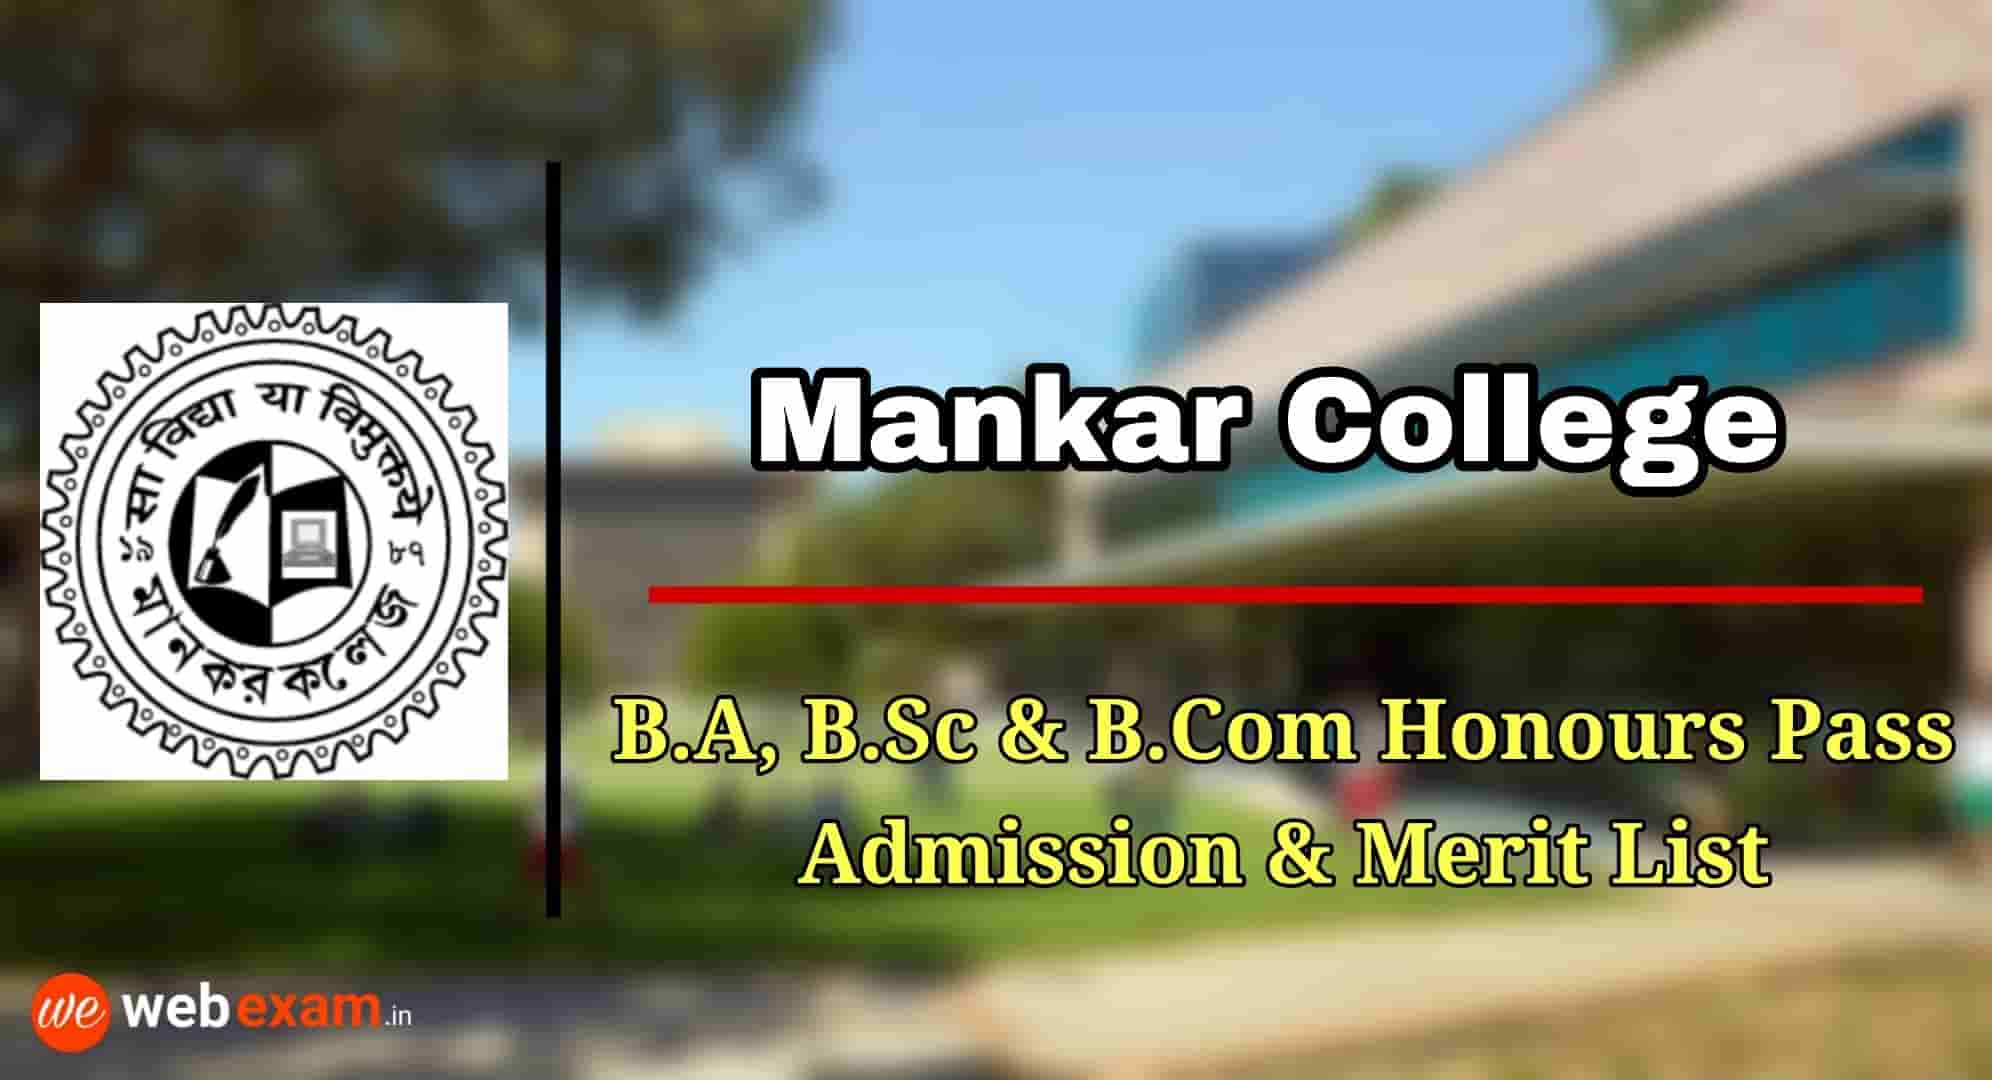 Mankar College Admission